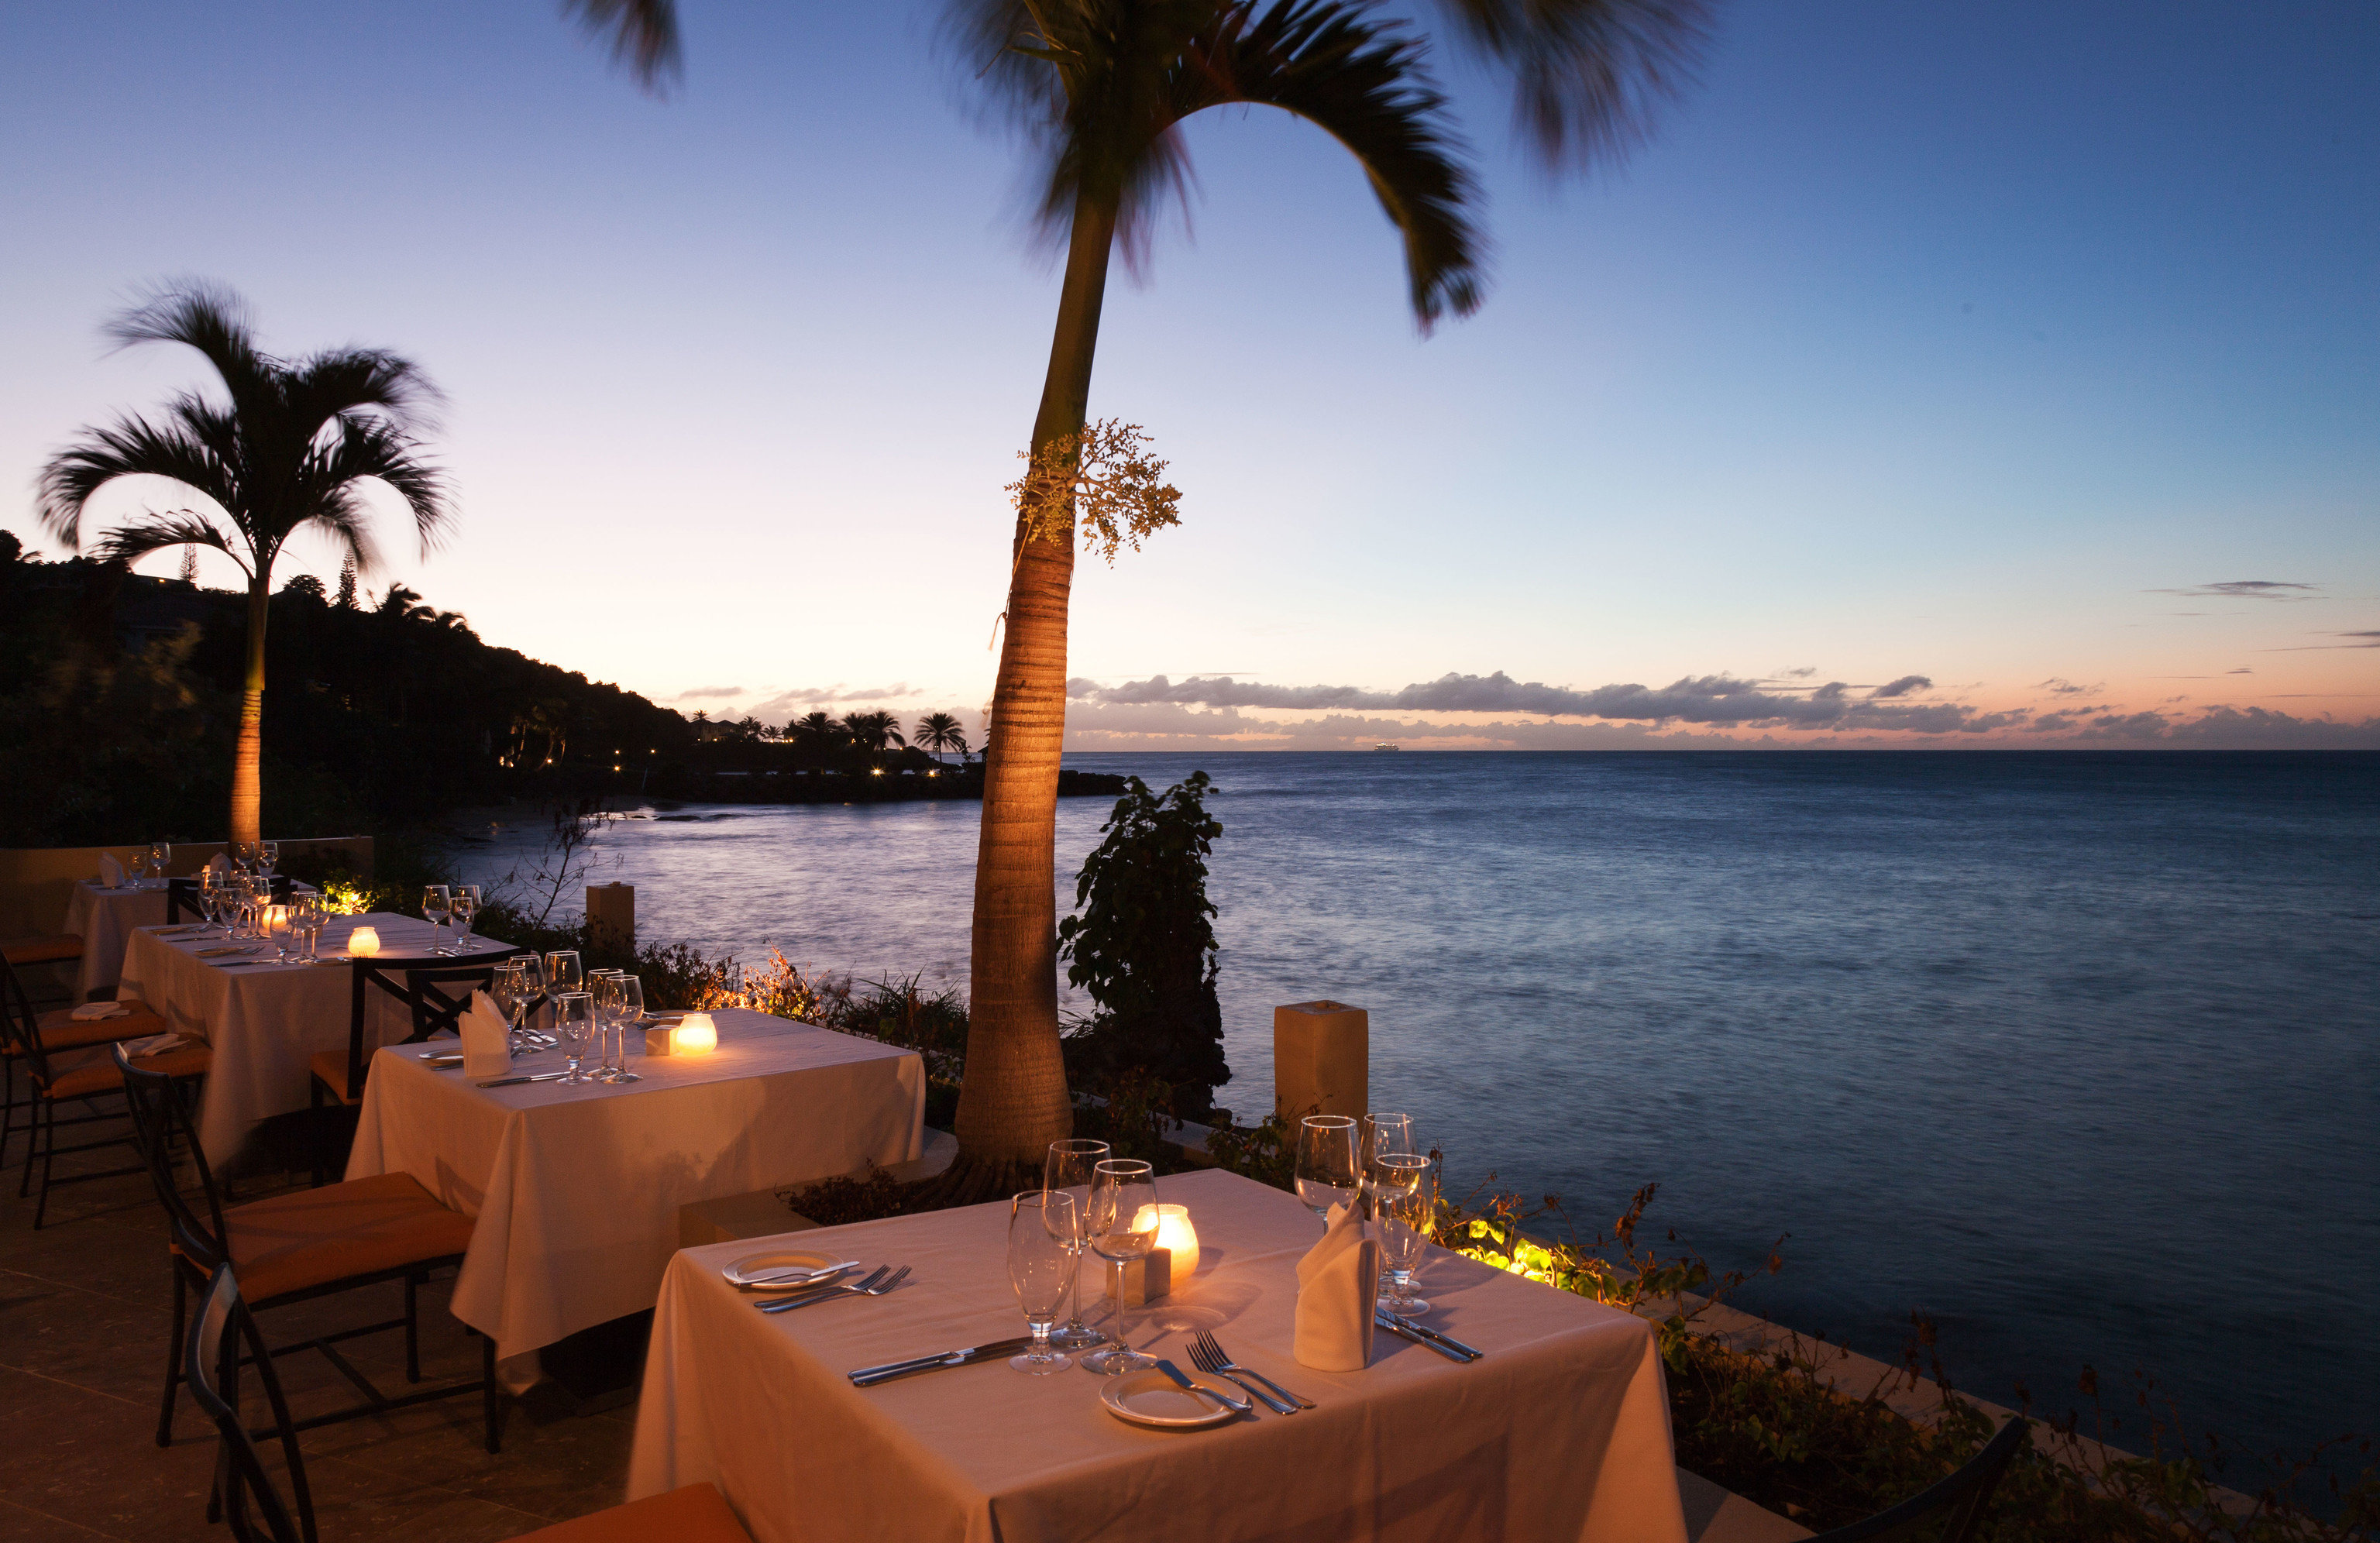 sky water Ocean evening arecales Sea tree Sunset restaurant Resort palm shore plant